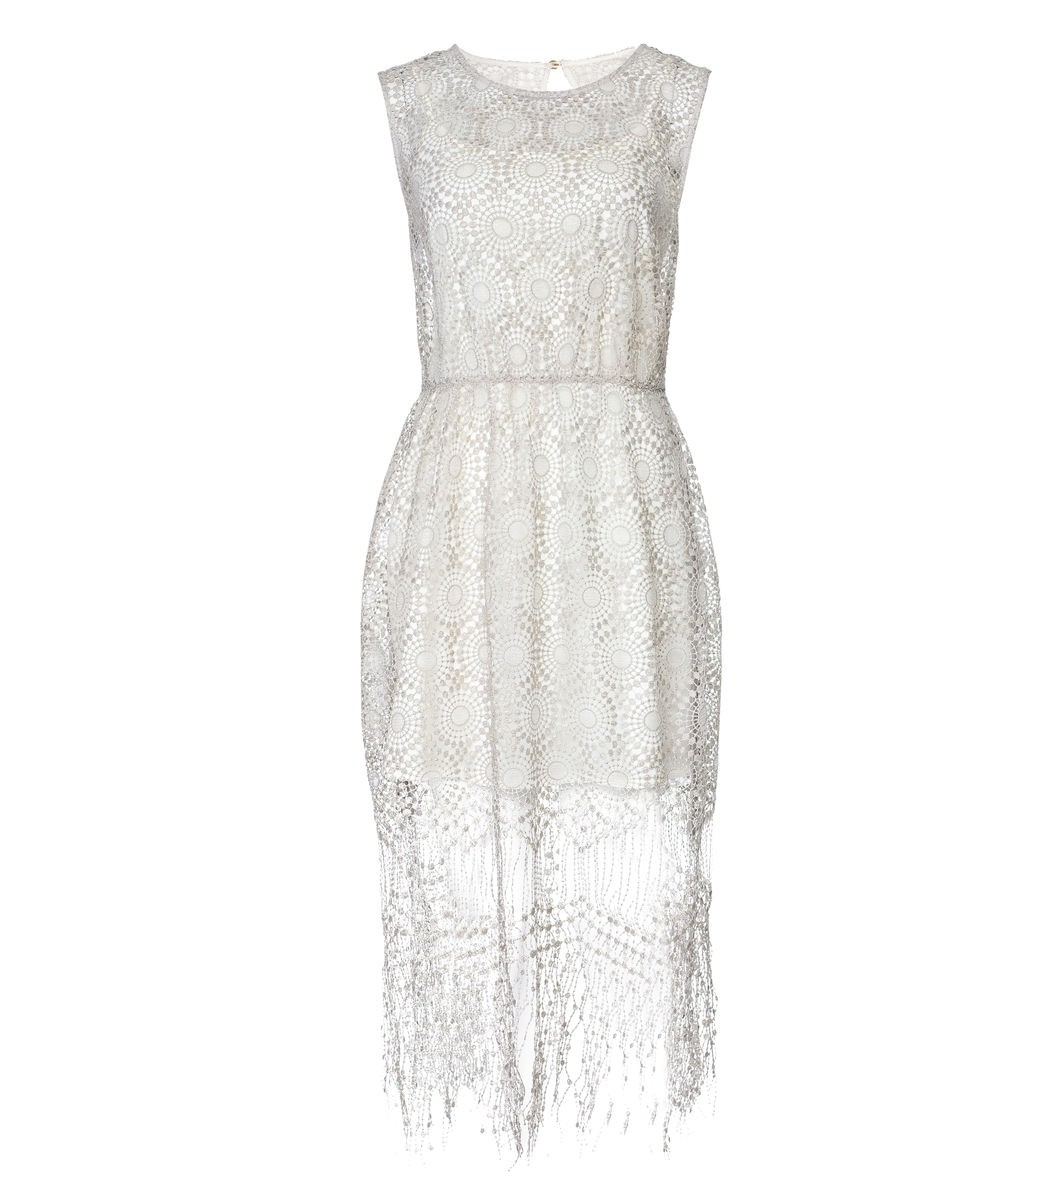 Monte Carlo Pantheon Dress